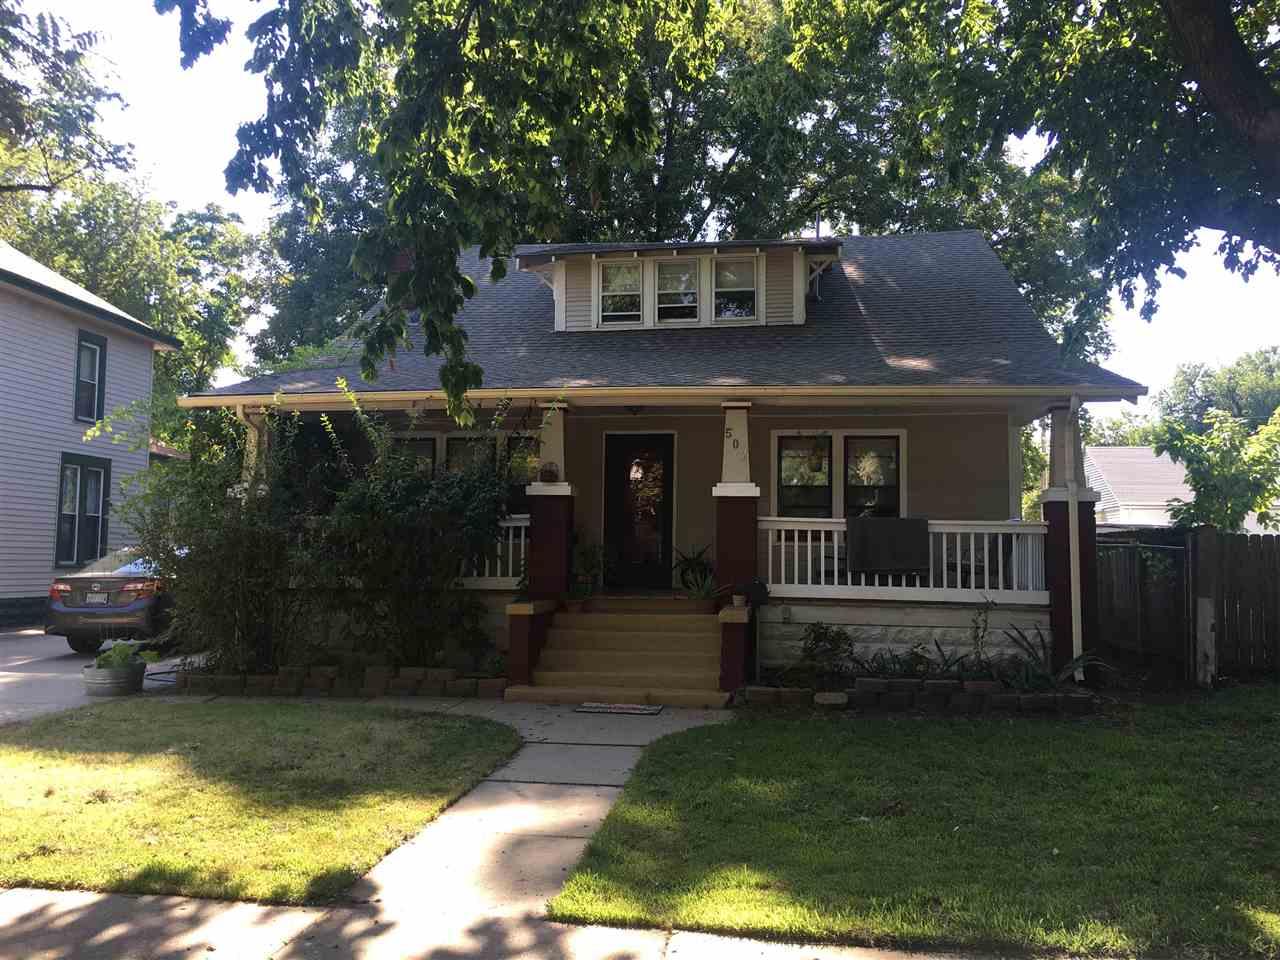 507 S Millwood Ave, Wichita, KS 67213